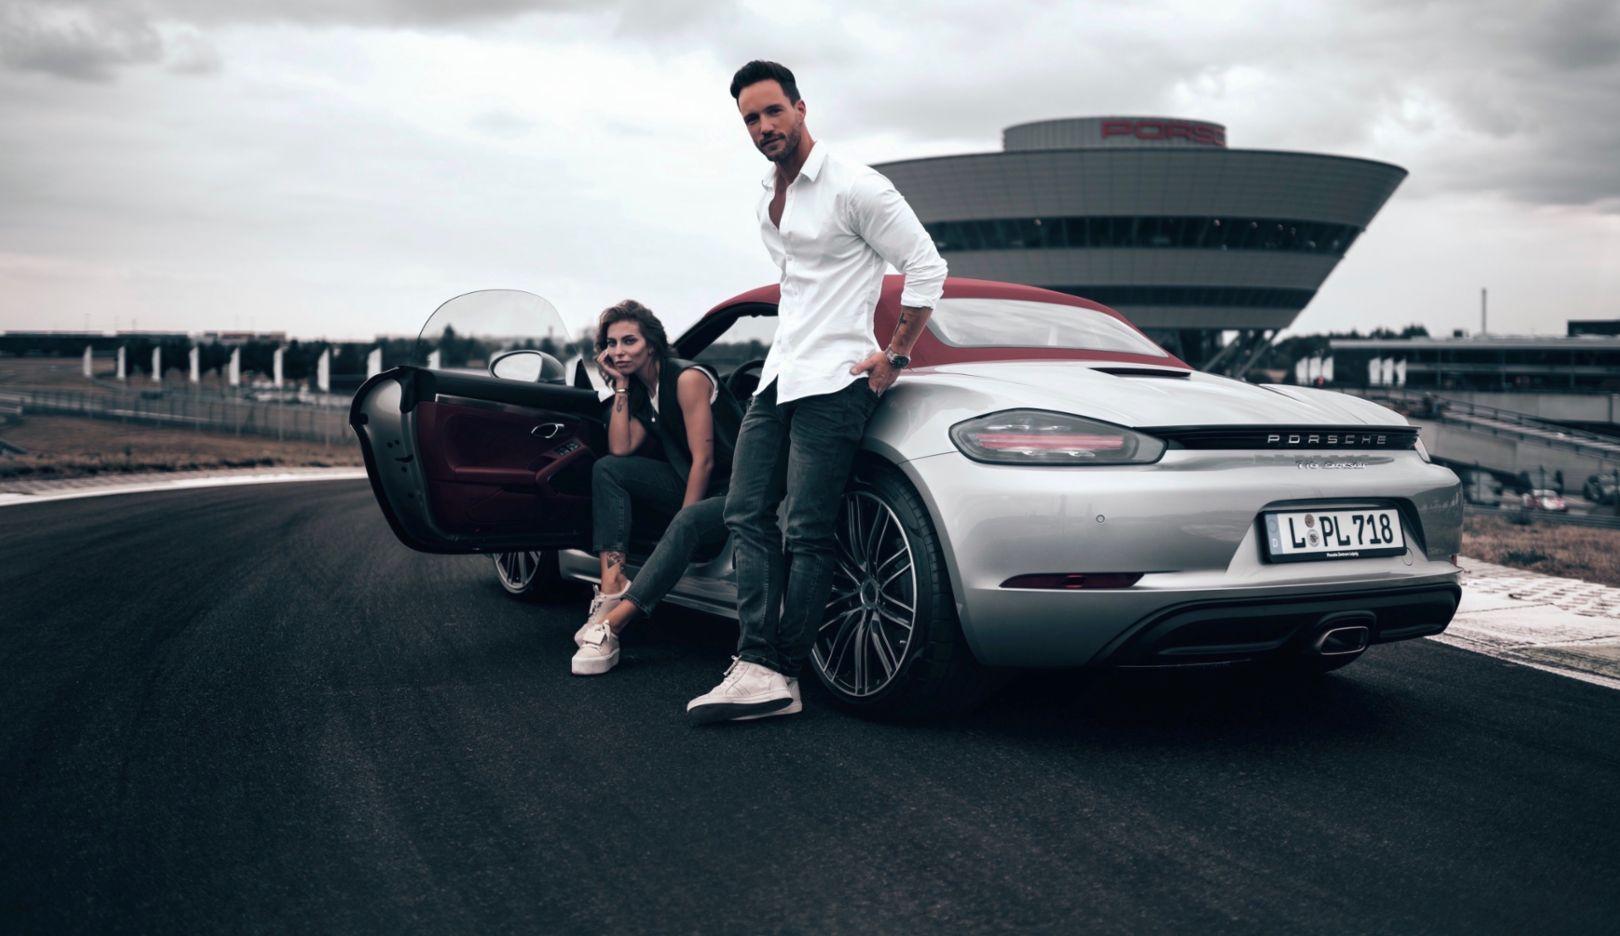 Masha Sedgwick, Modebloggerin, Daniel Fuchs aka Magic Fox, Influencer, l-r, 718 Boxster, Leipzig, 2018, Porsche AG